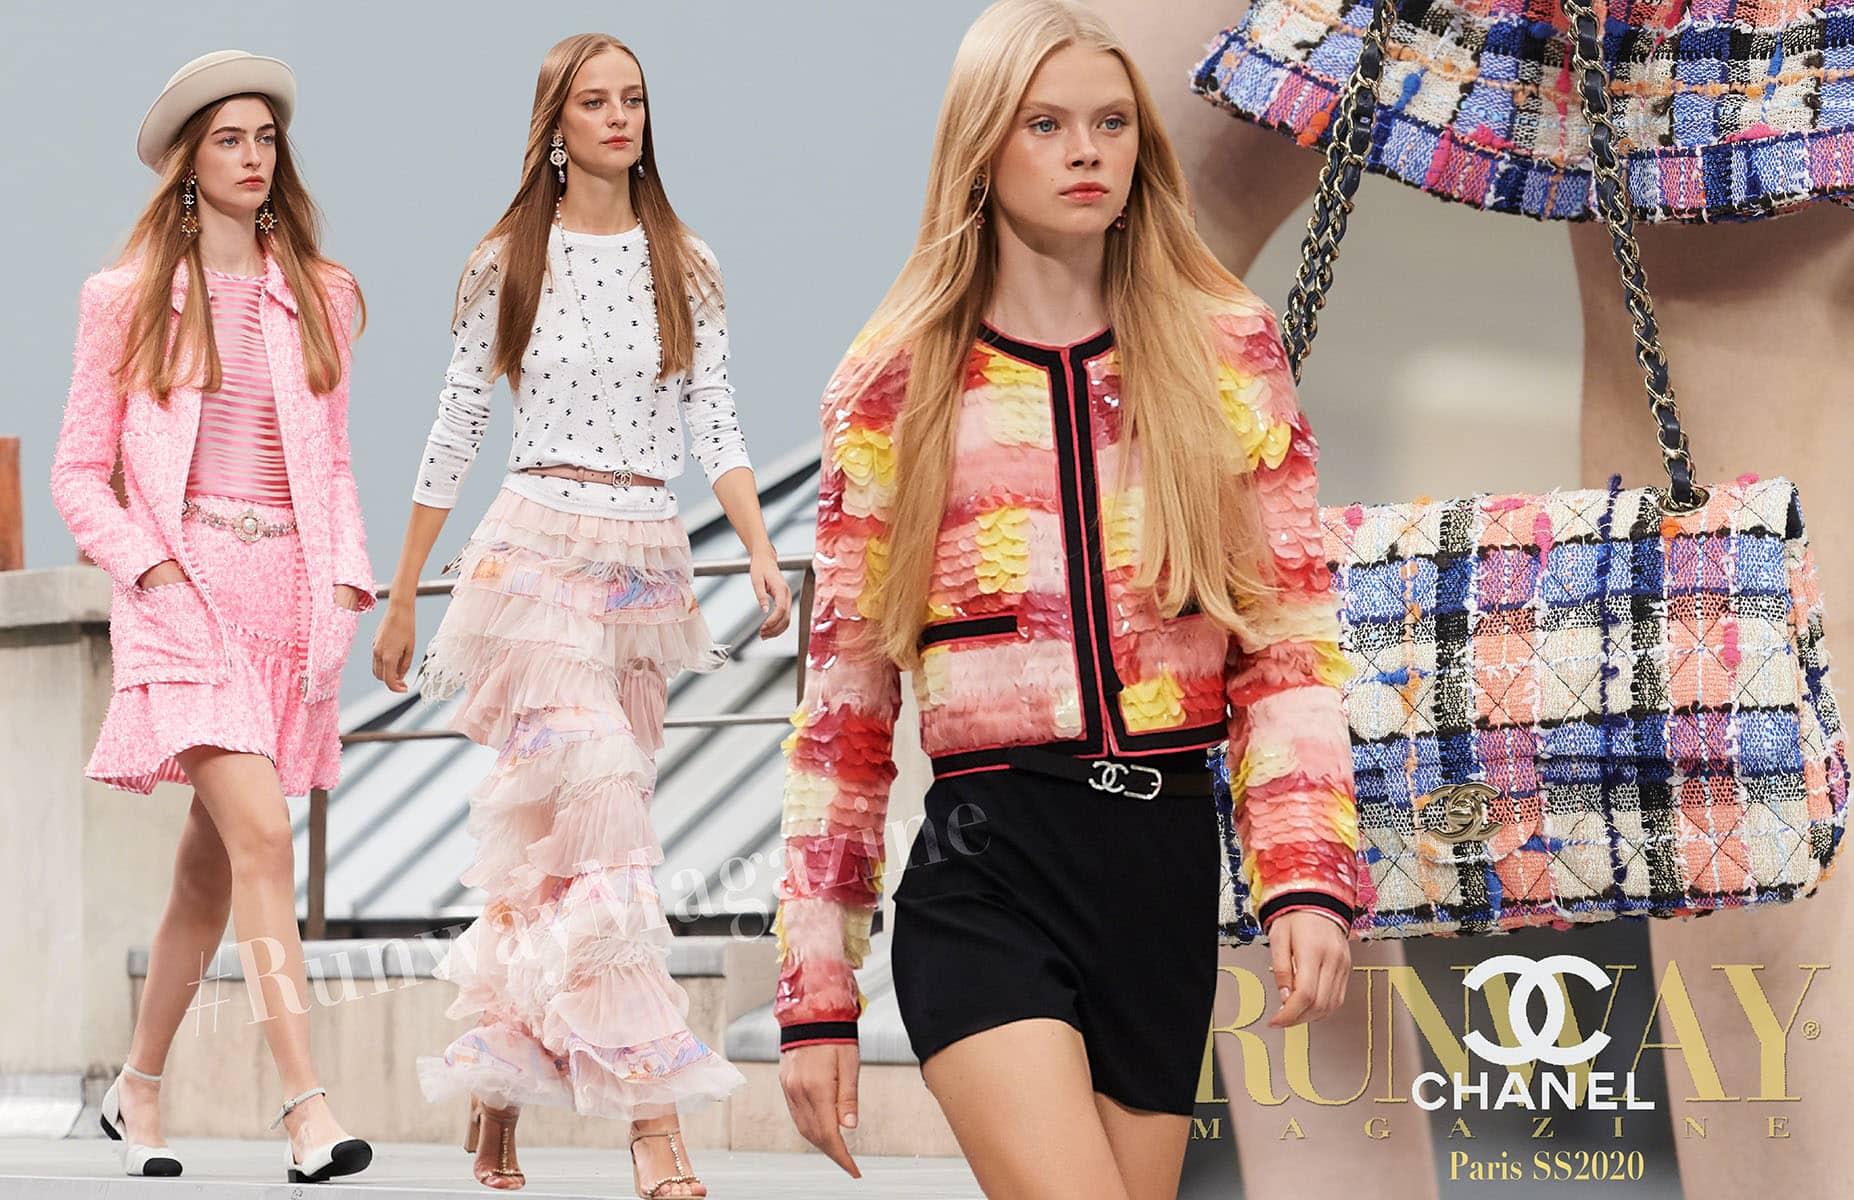 Chanel Spring Summer 2020 Paris by RUNWAY MAGAZINE